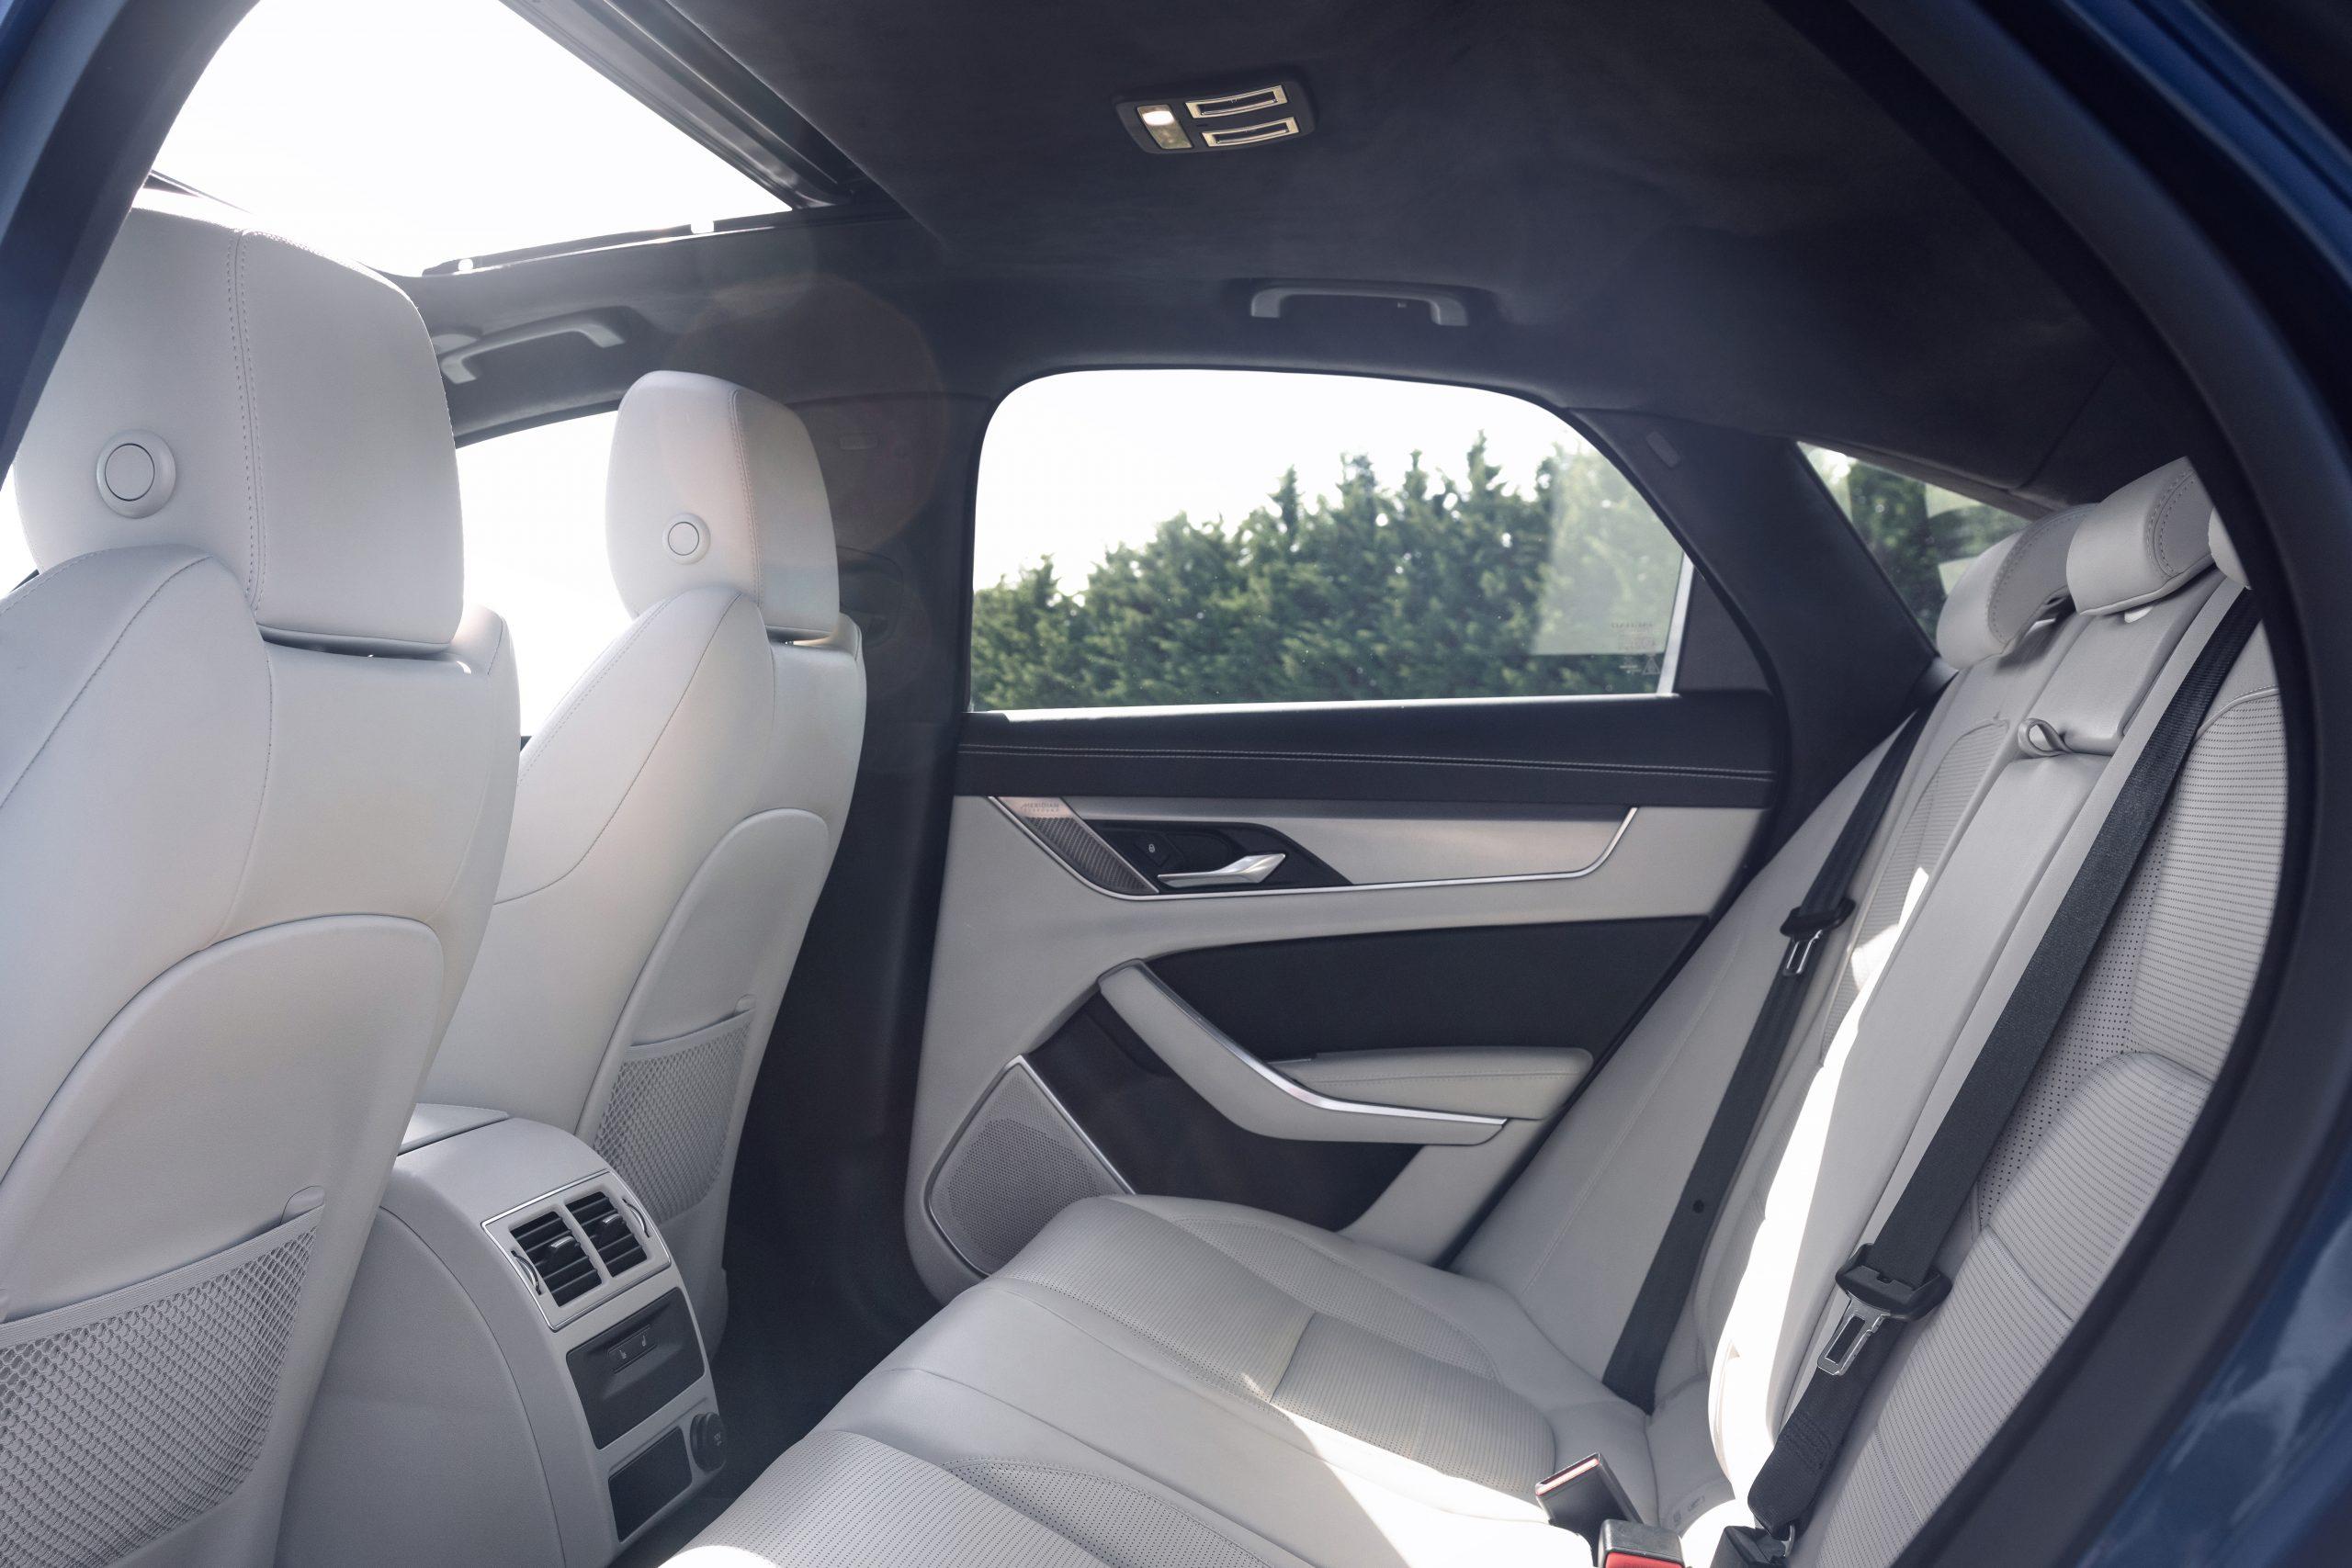 2021 Jaguar XF interior rear seats